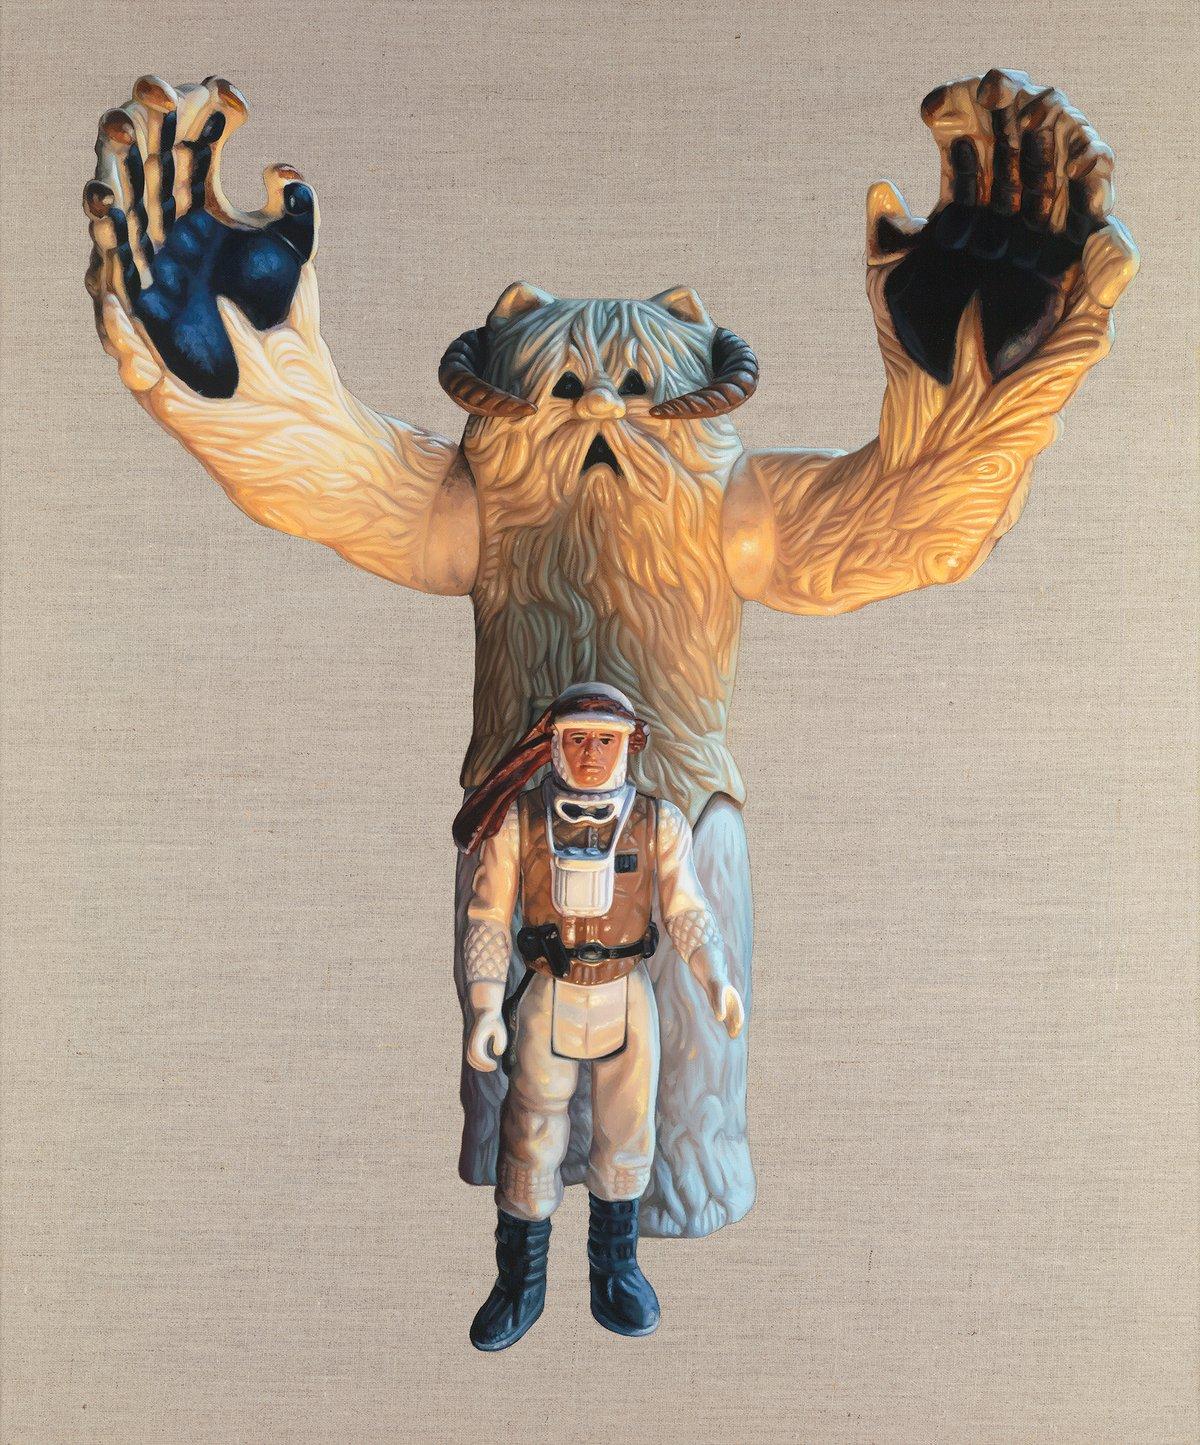 Luke Skywalker & Wampa // Original Oil Painting